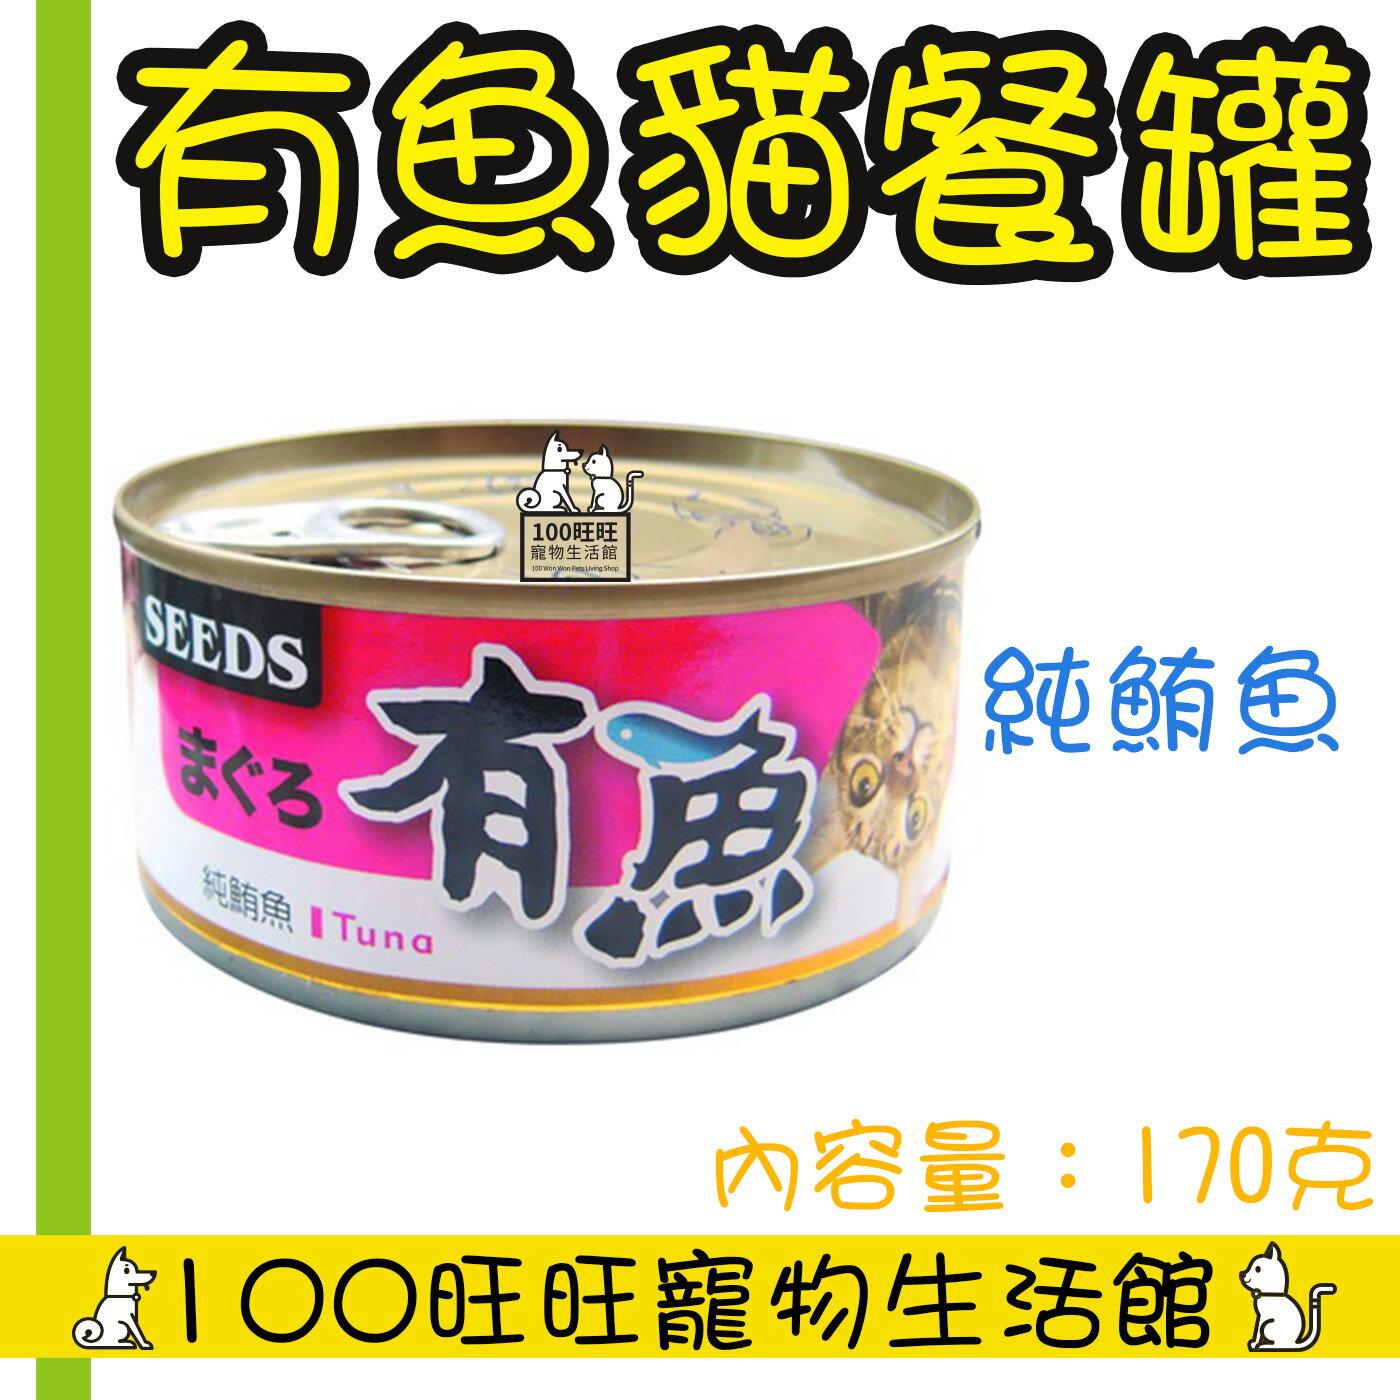 SEEDS 惜時 聖萊西 有魚貓餐罐 170g 單罐